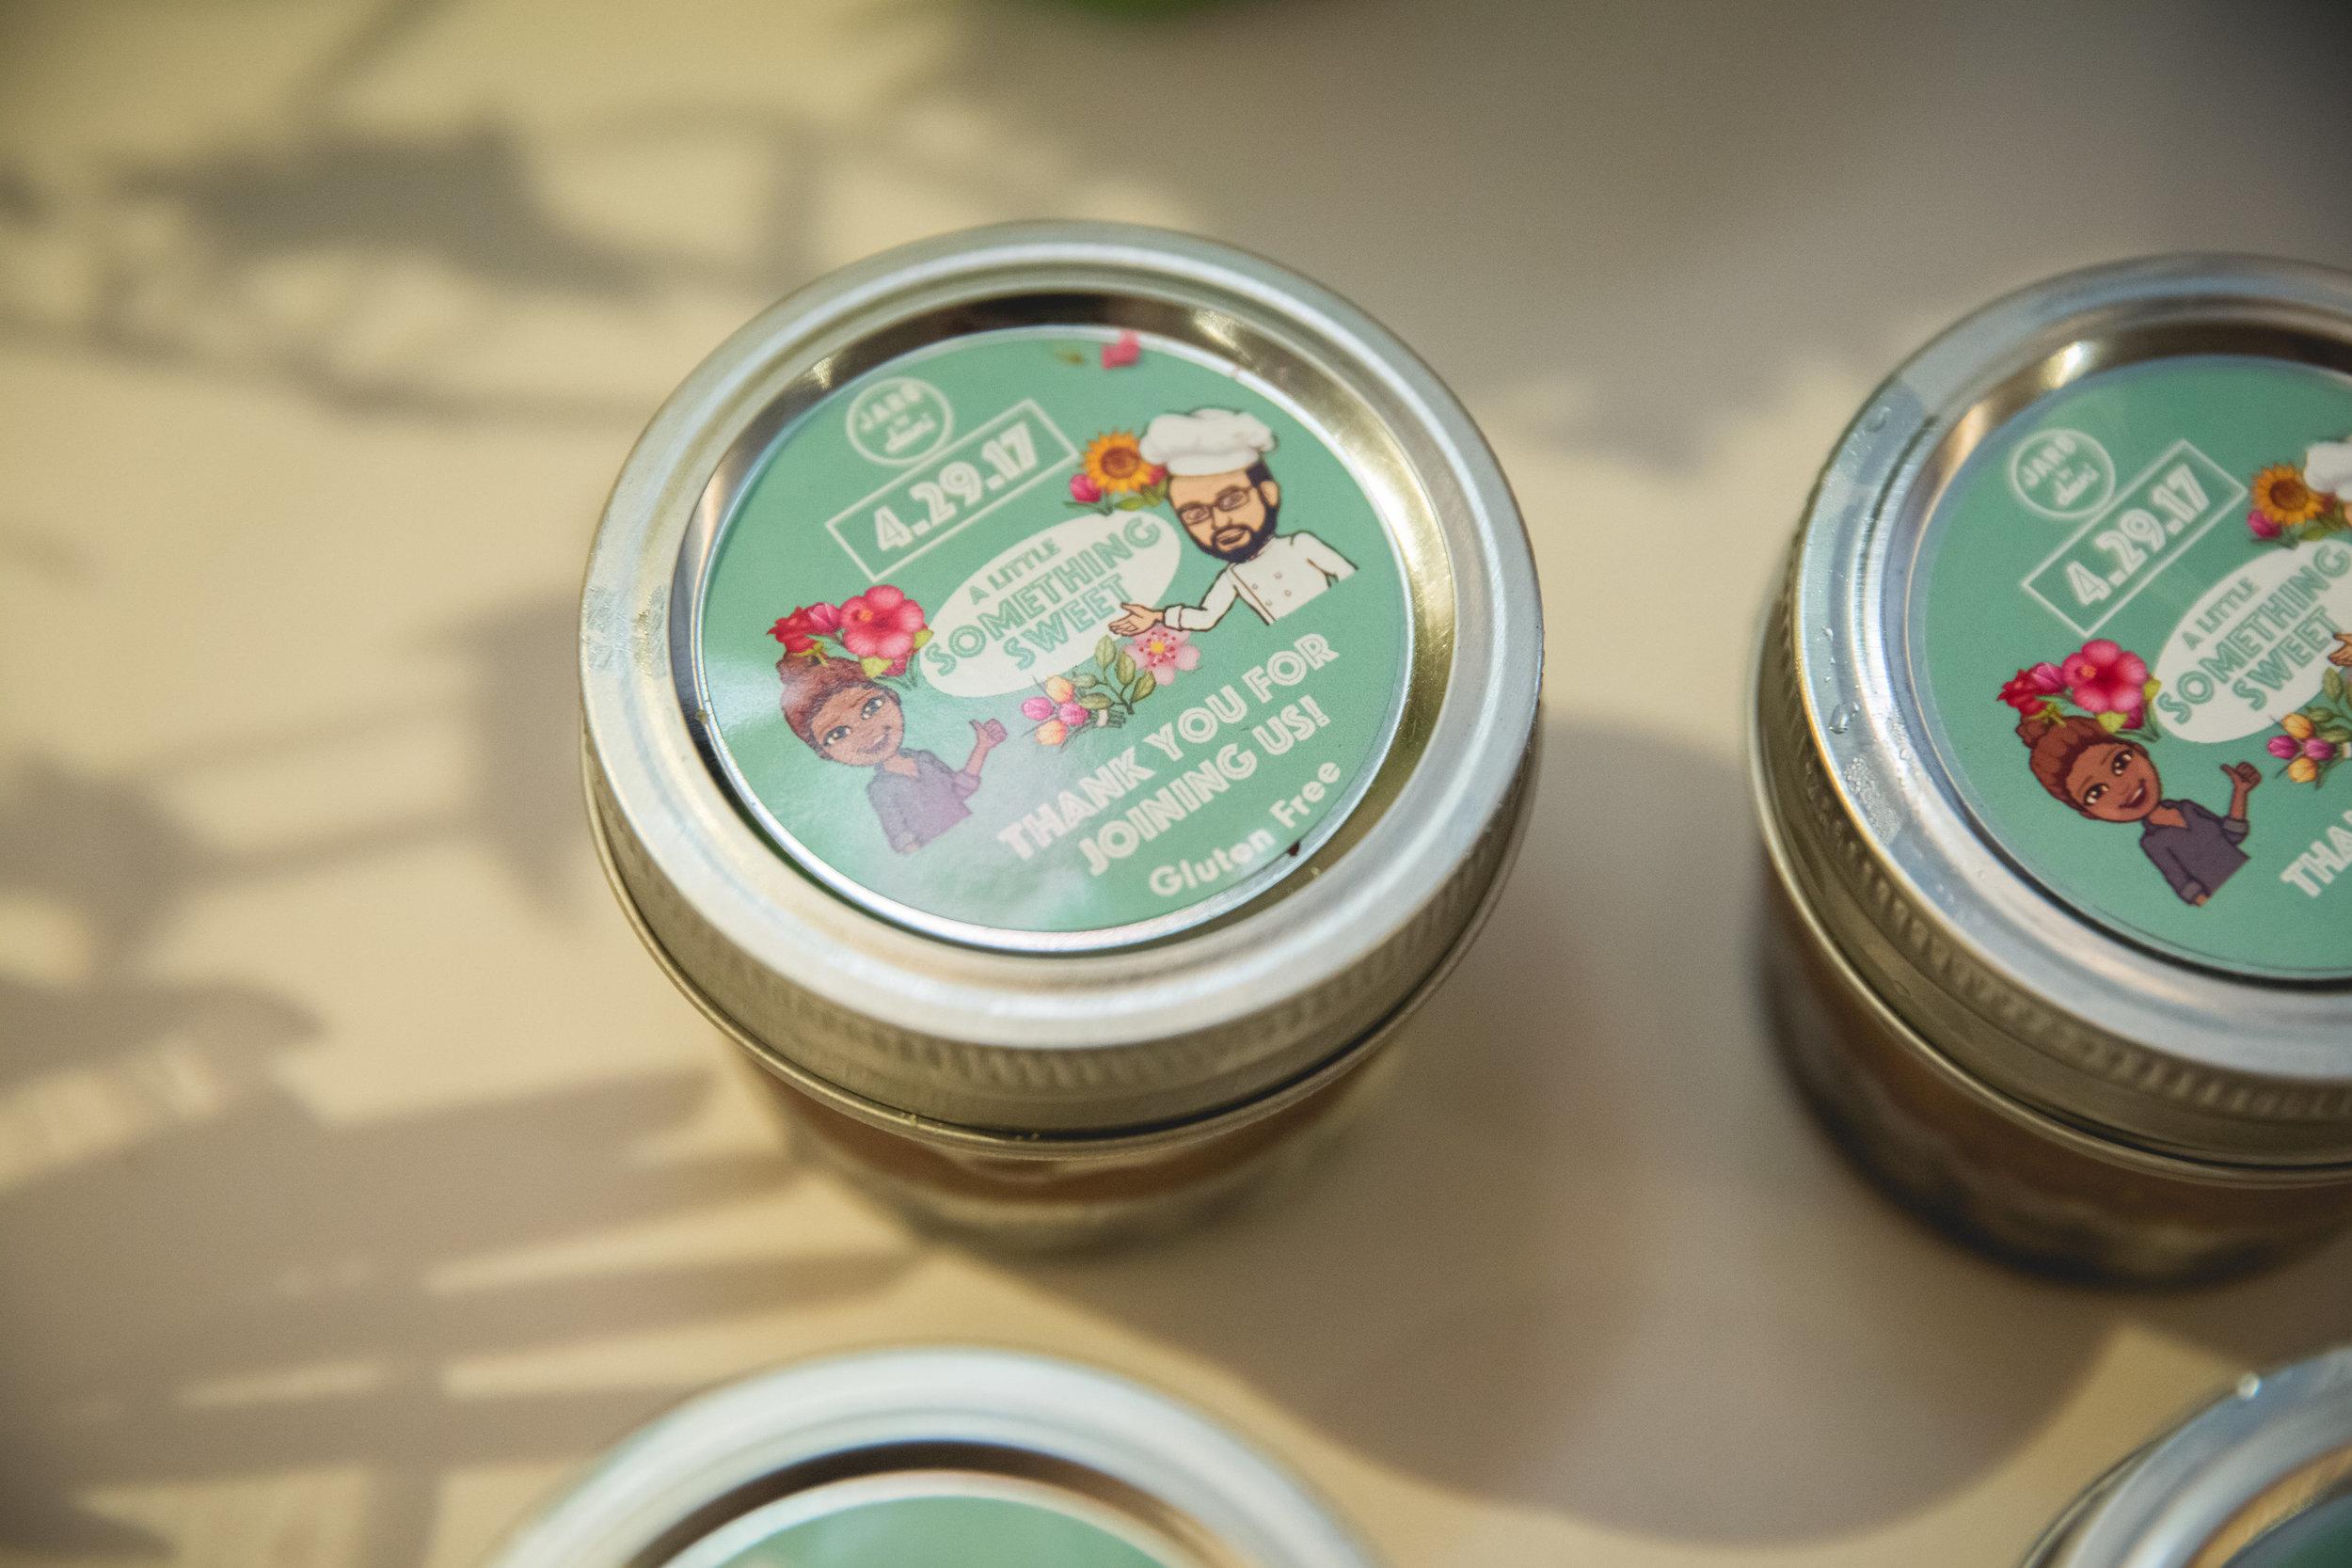 Jars by Dani Wedding Favors. Photo by Heartfelt Studios.